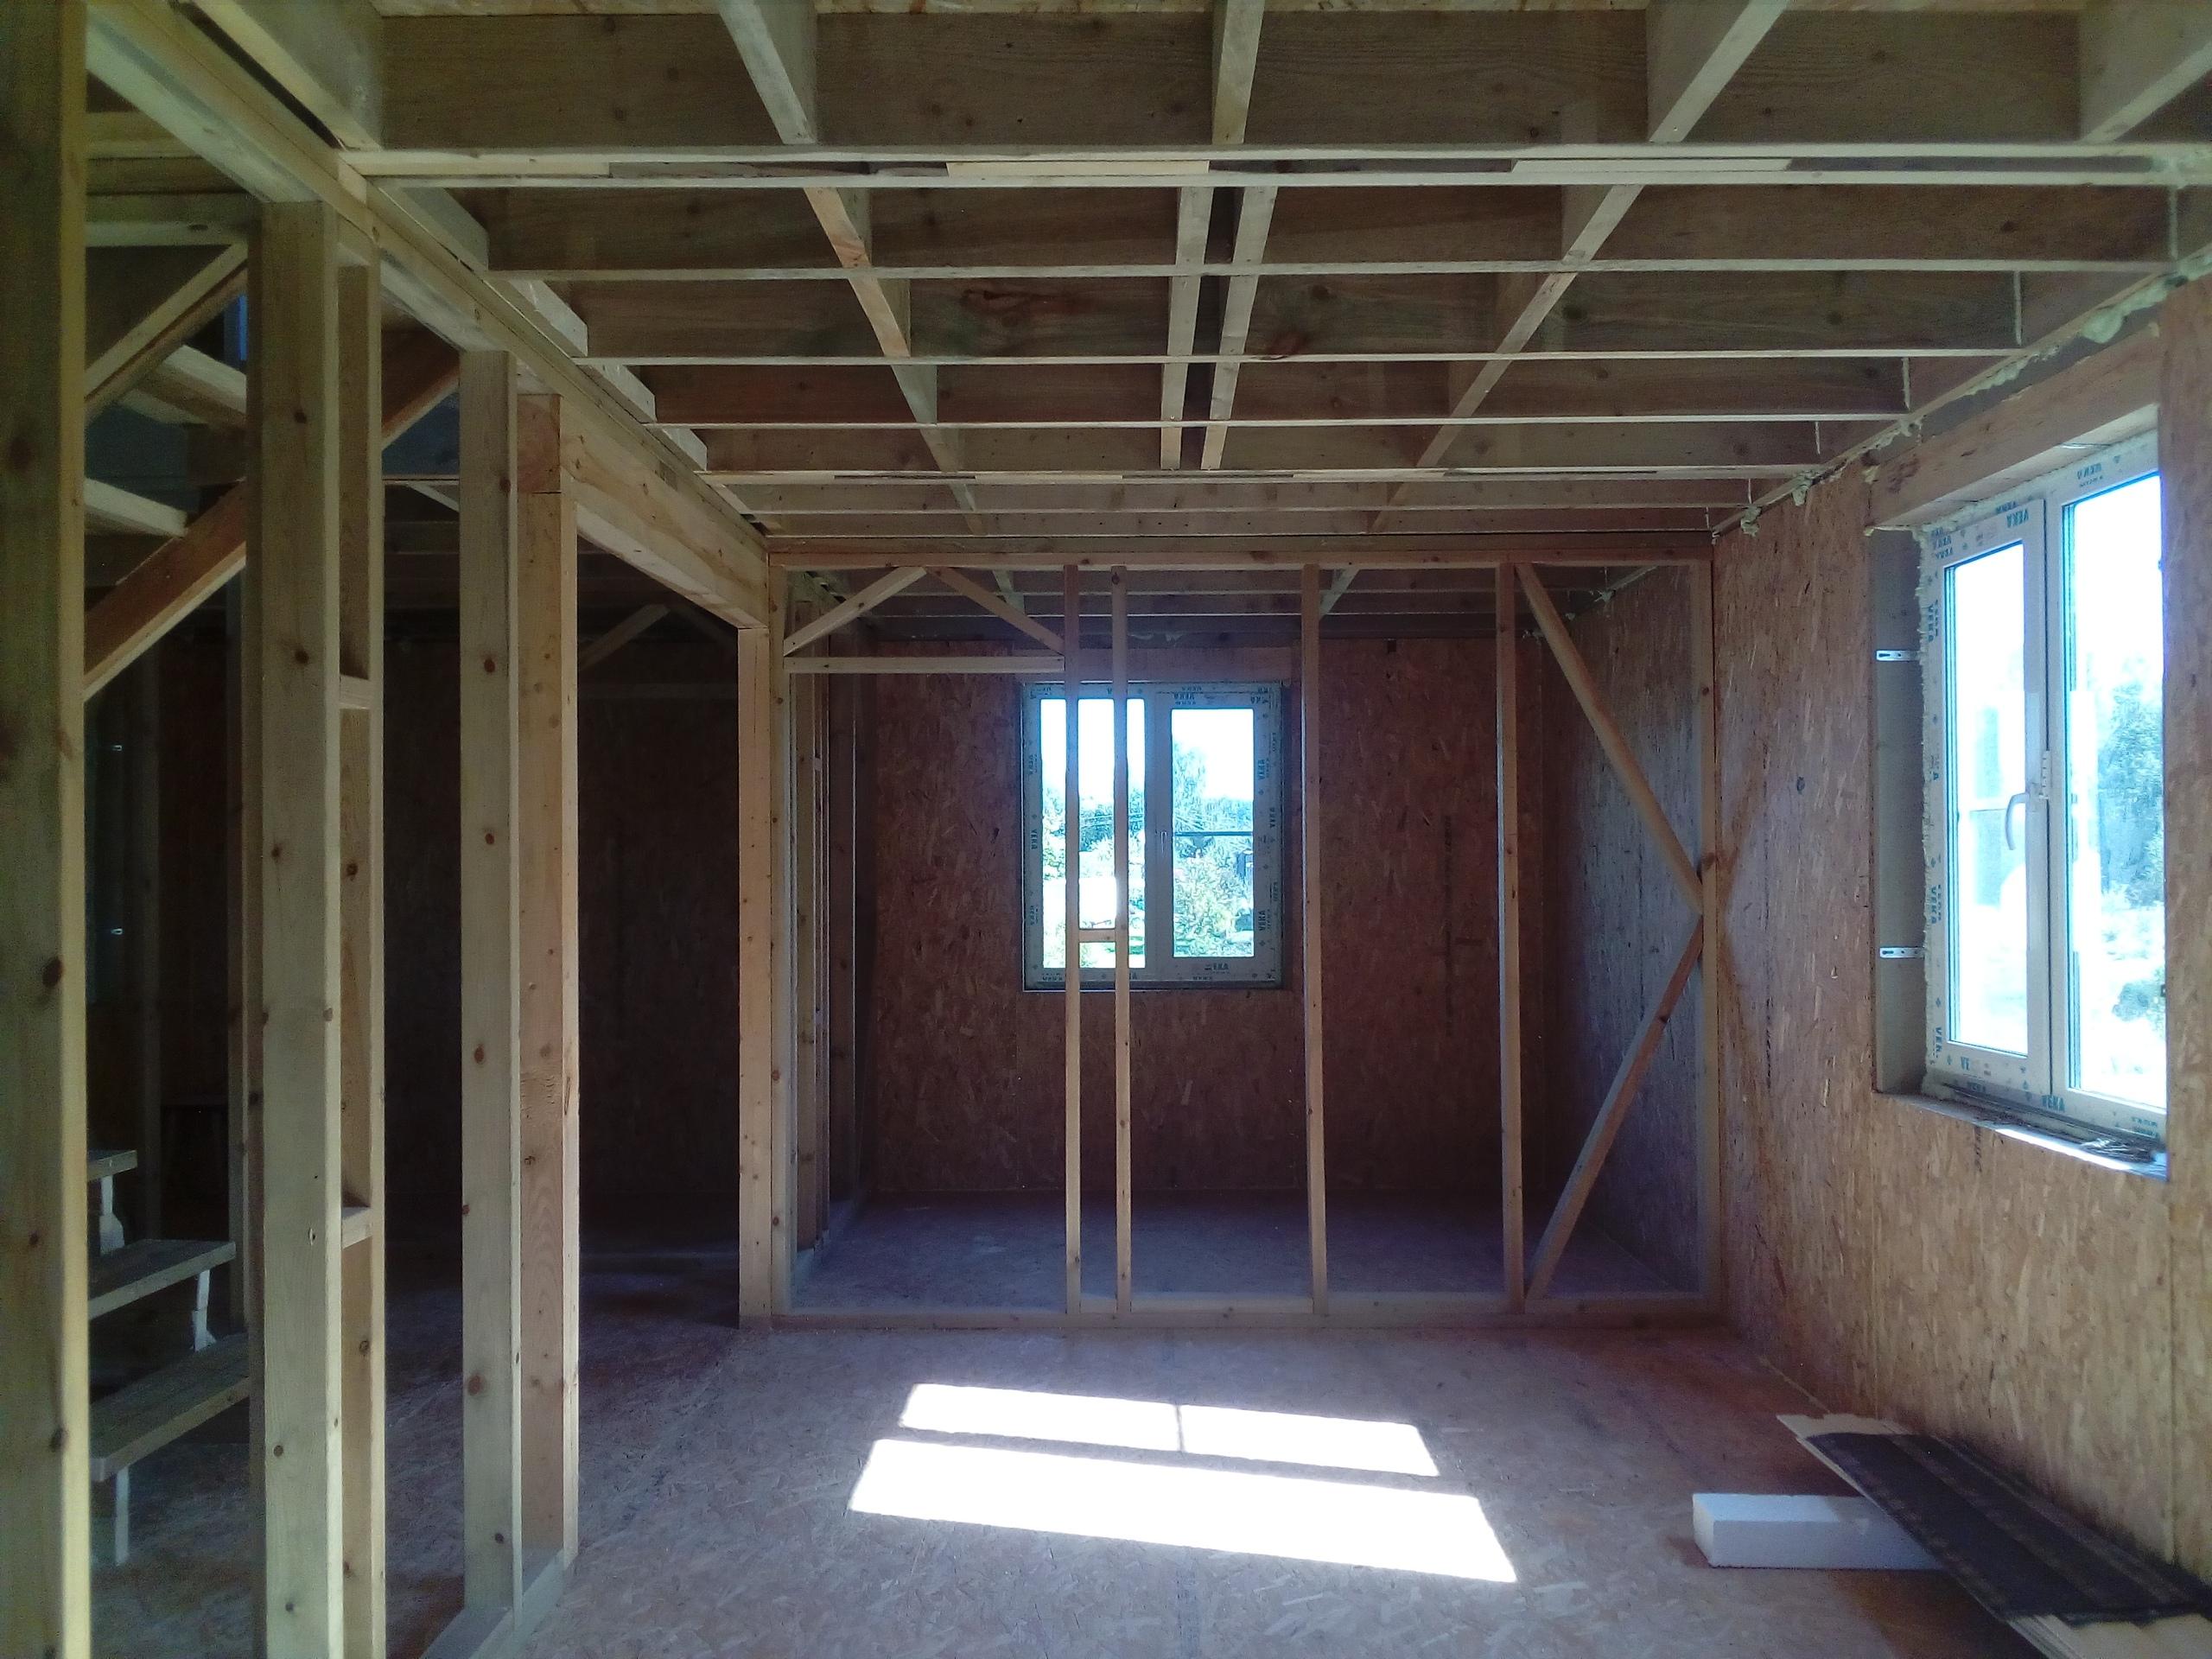 фото дома из сип панелей №4 шугозеро